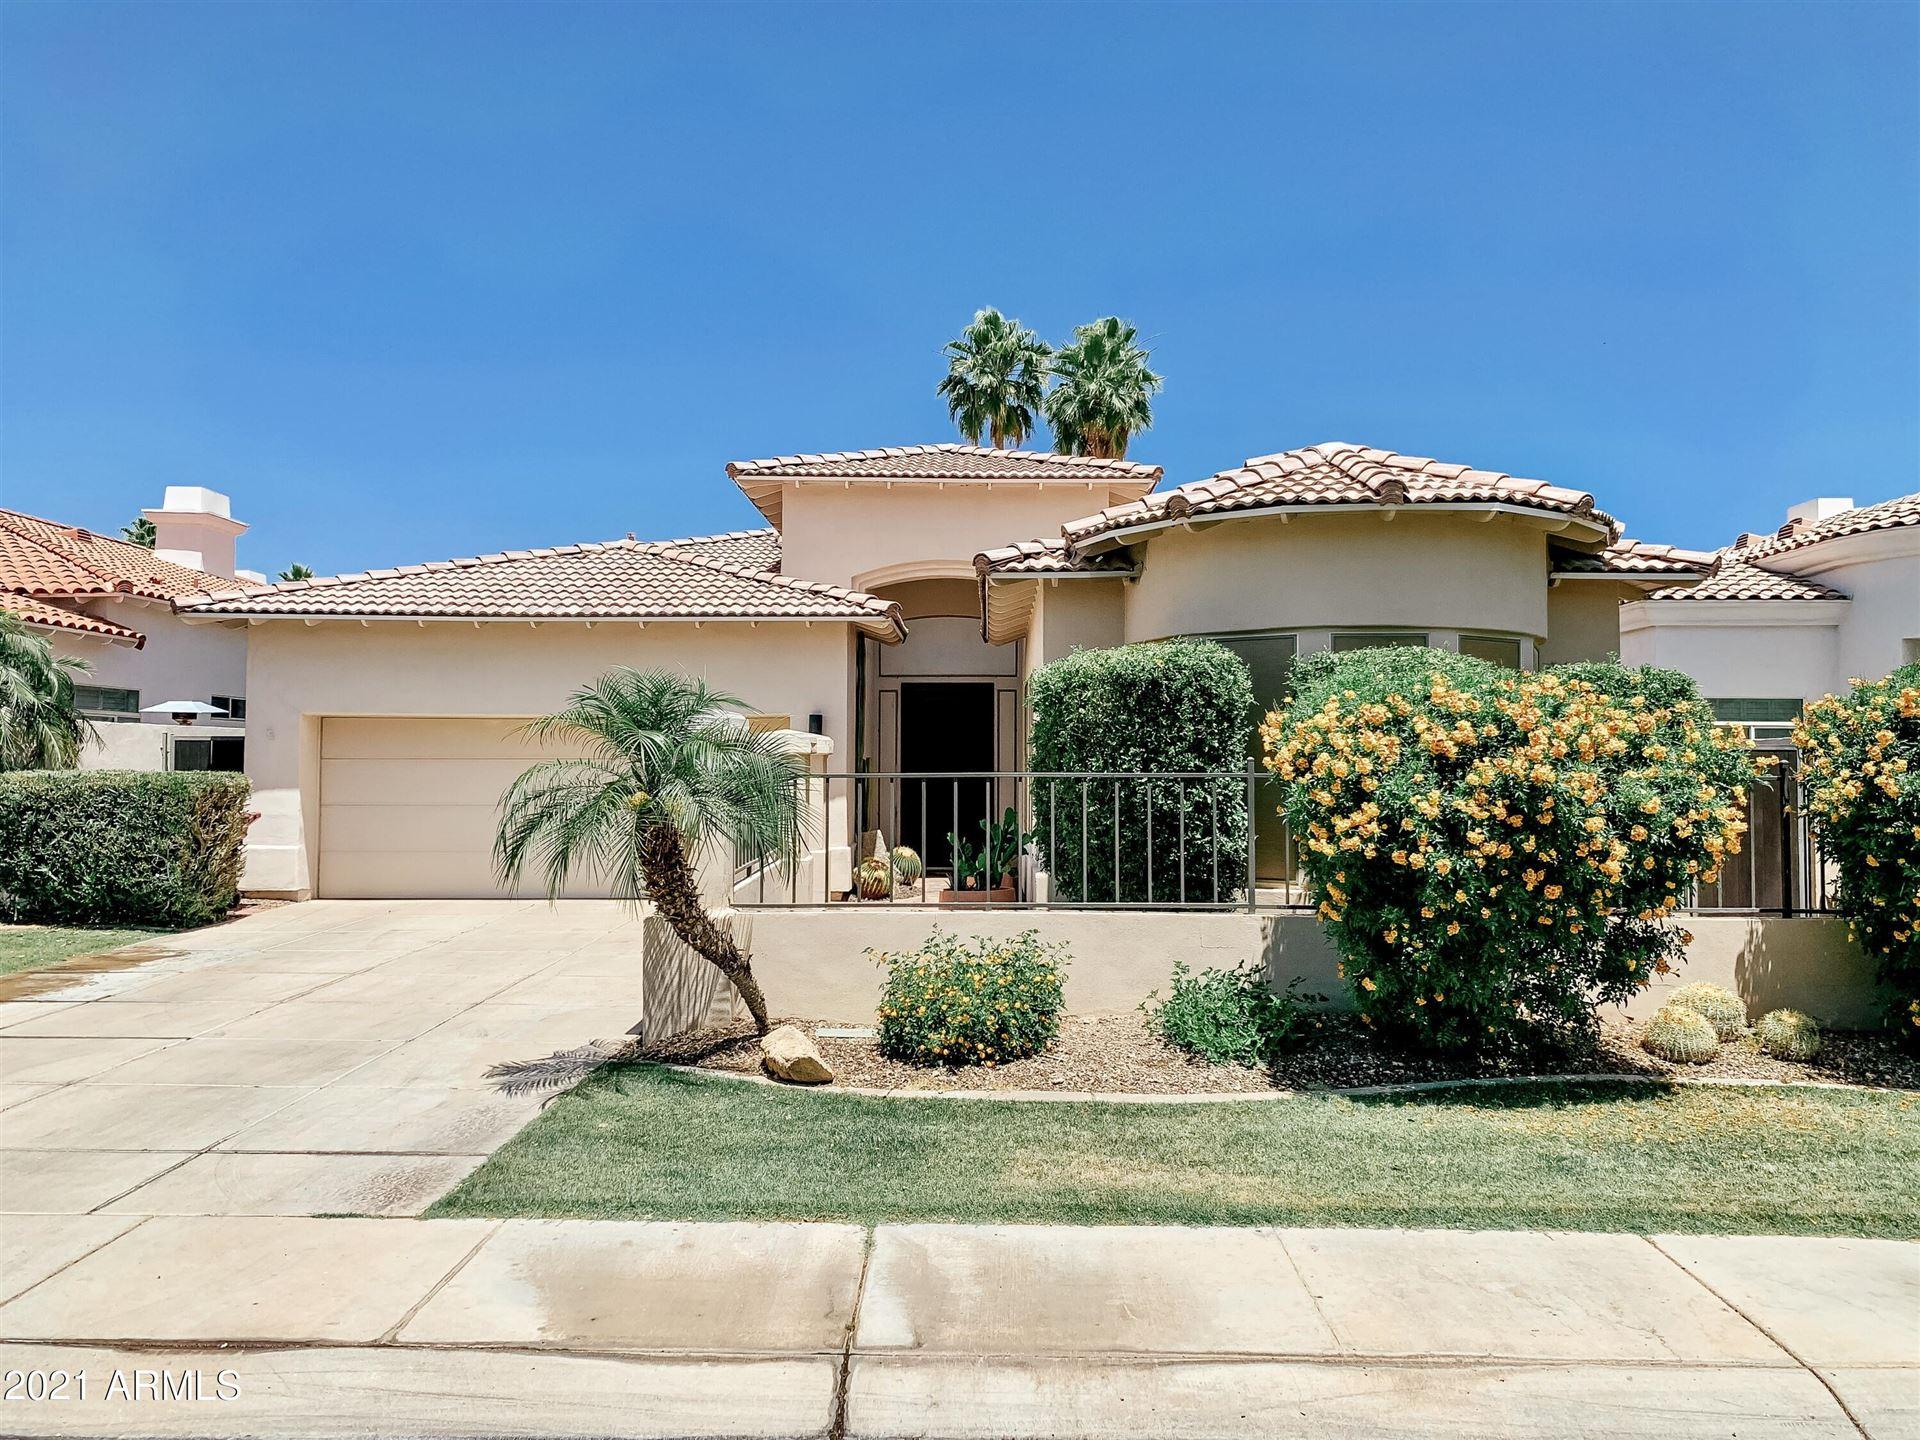 7656 E KRALL Street, Scottsdale, AZ 85250 - MLS#: 6234244